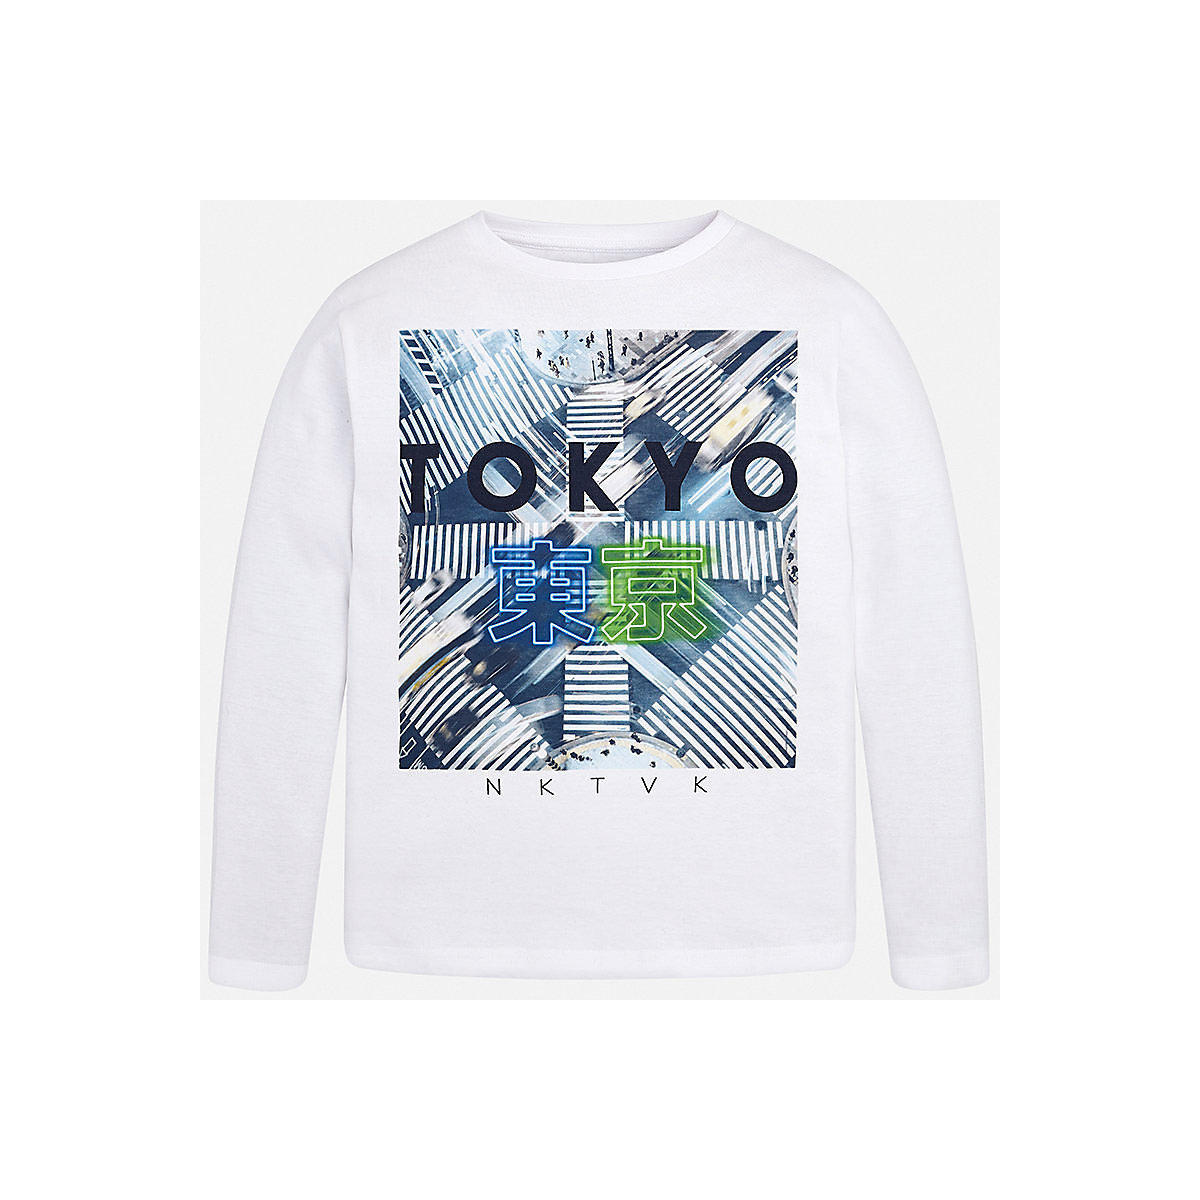 MAYORAL Blouses & Shirts 8848925 Boys Cotton  clothes baby boy children child wear blouses